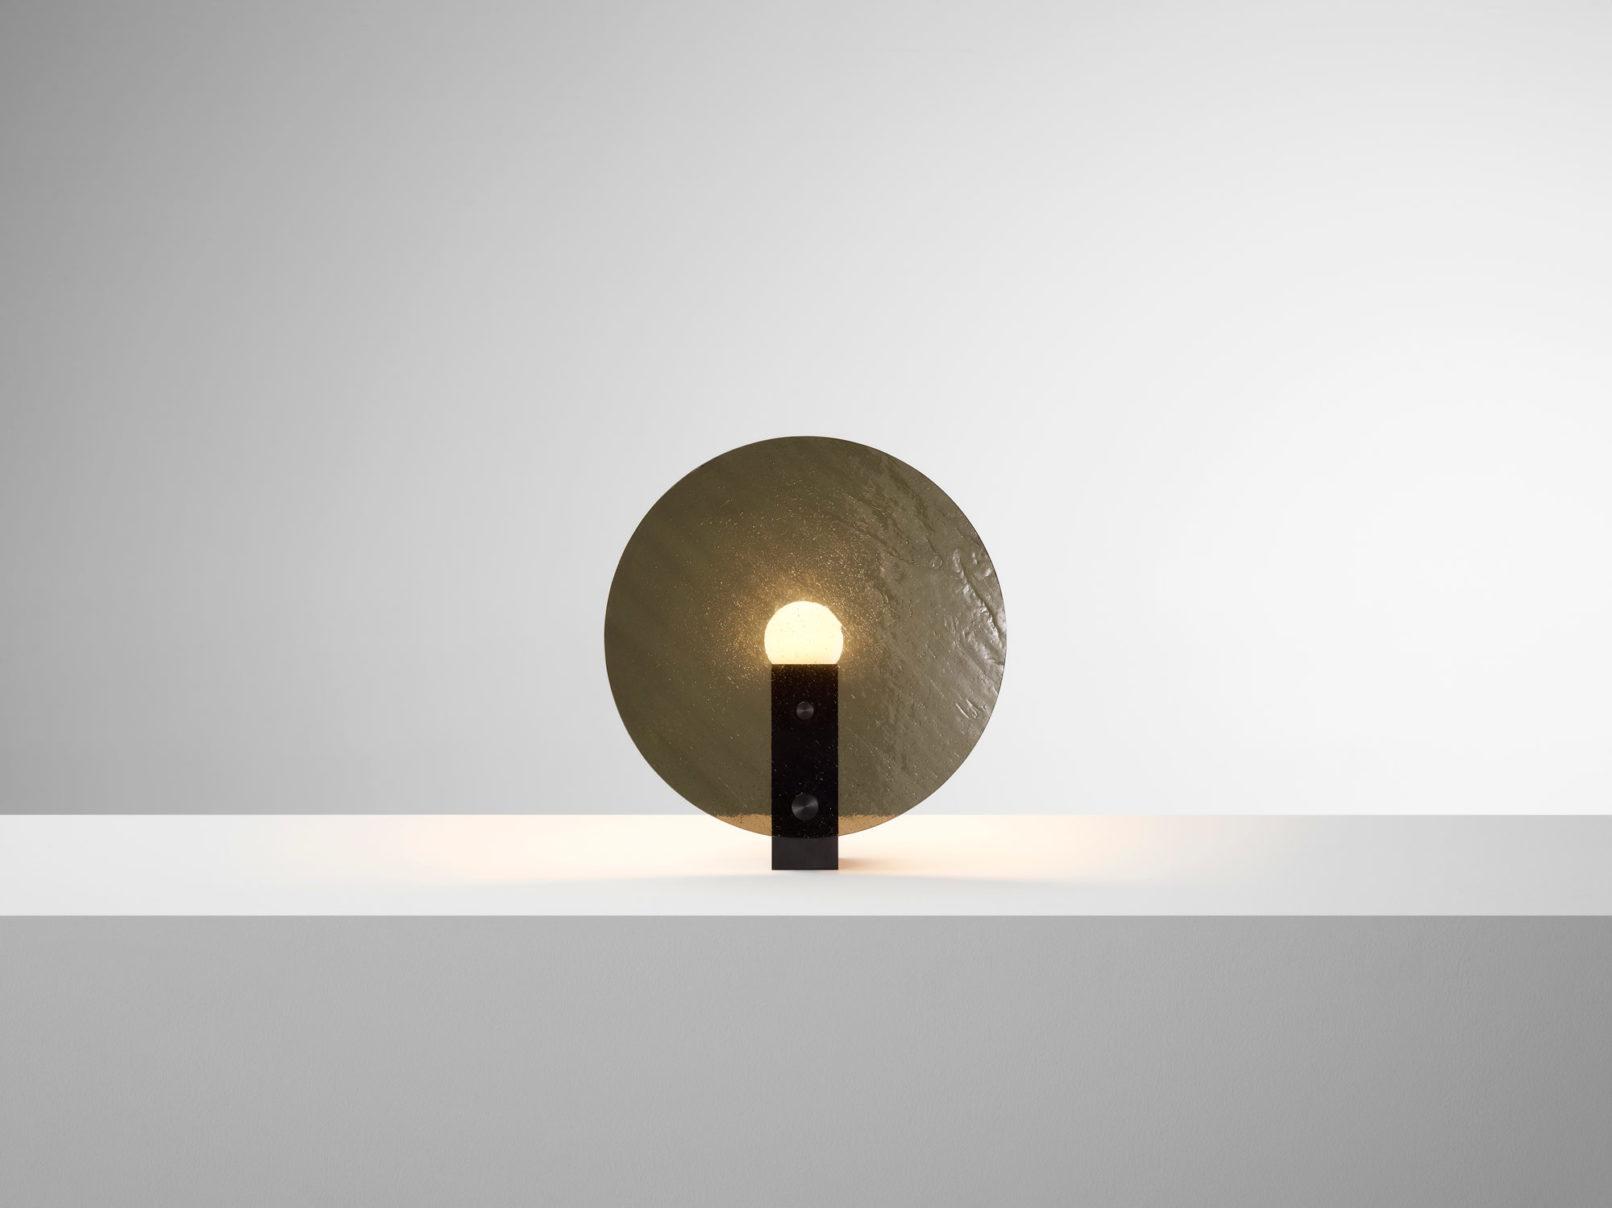 Nebulae_Desk_Lamp_2-1-1612x1208.jpg